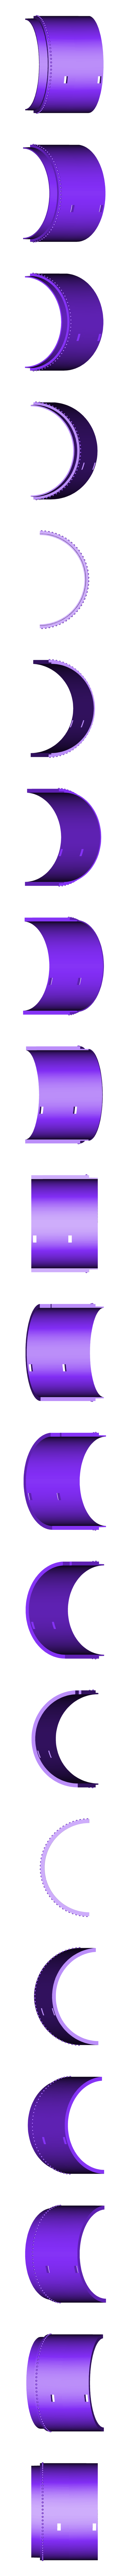 Boiler_Section_2_-_SCALED_Part_3.STL Download free STL file 4-8-8-4 Big Boy Locomotive • 3D printer object, RaymondDeLuca